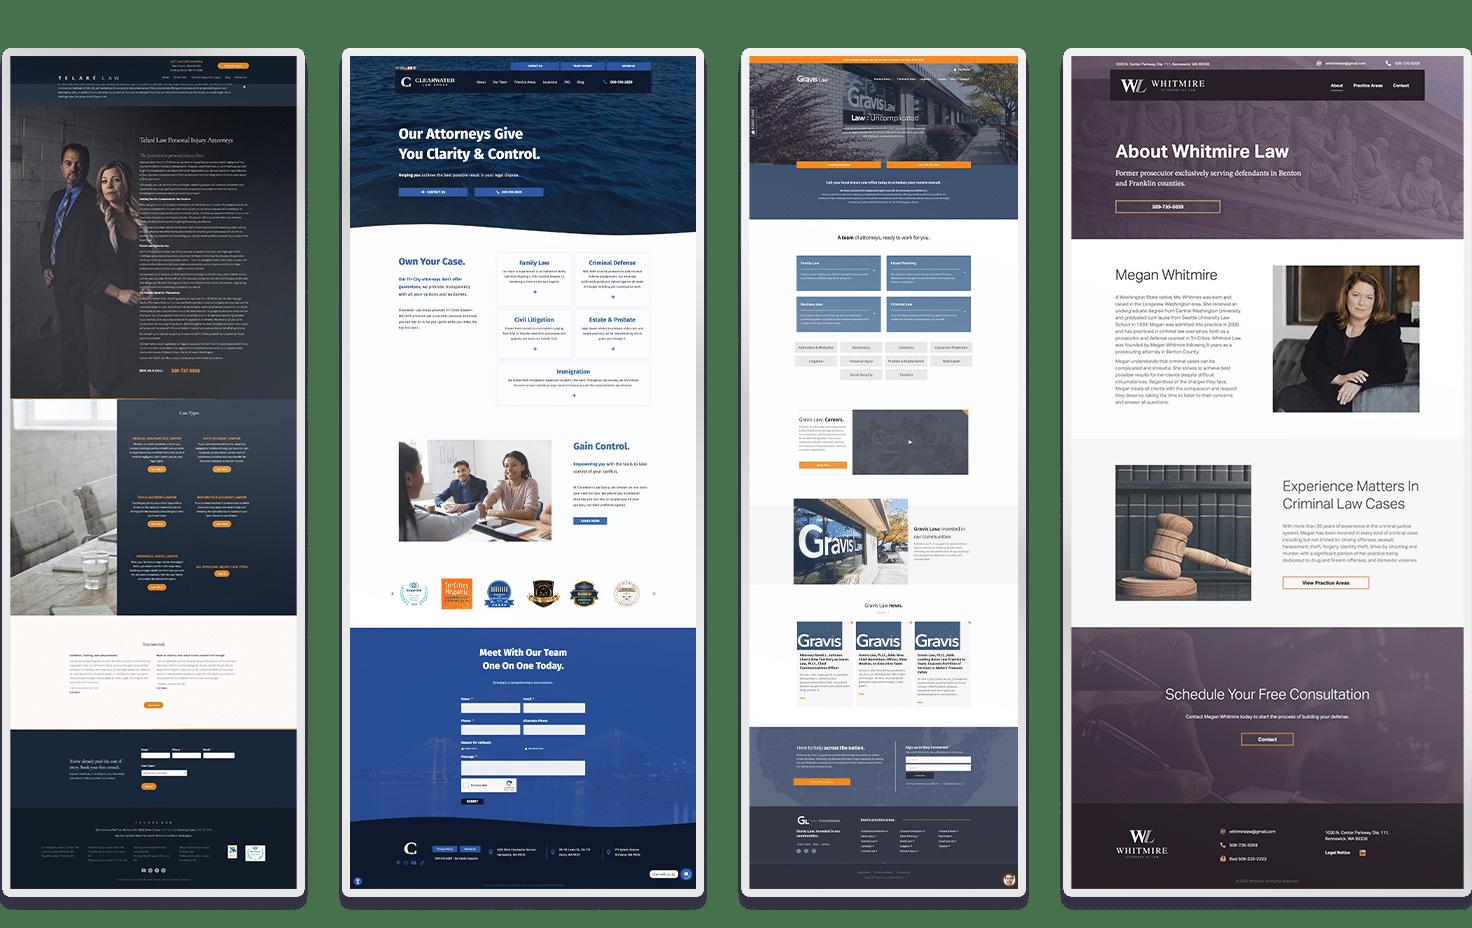 examples of BrandCraft legal website designs